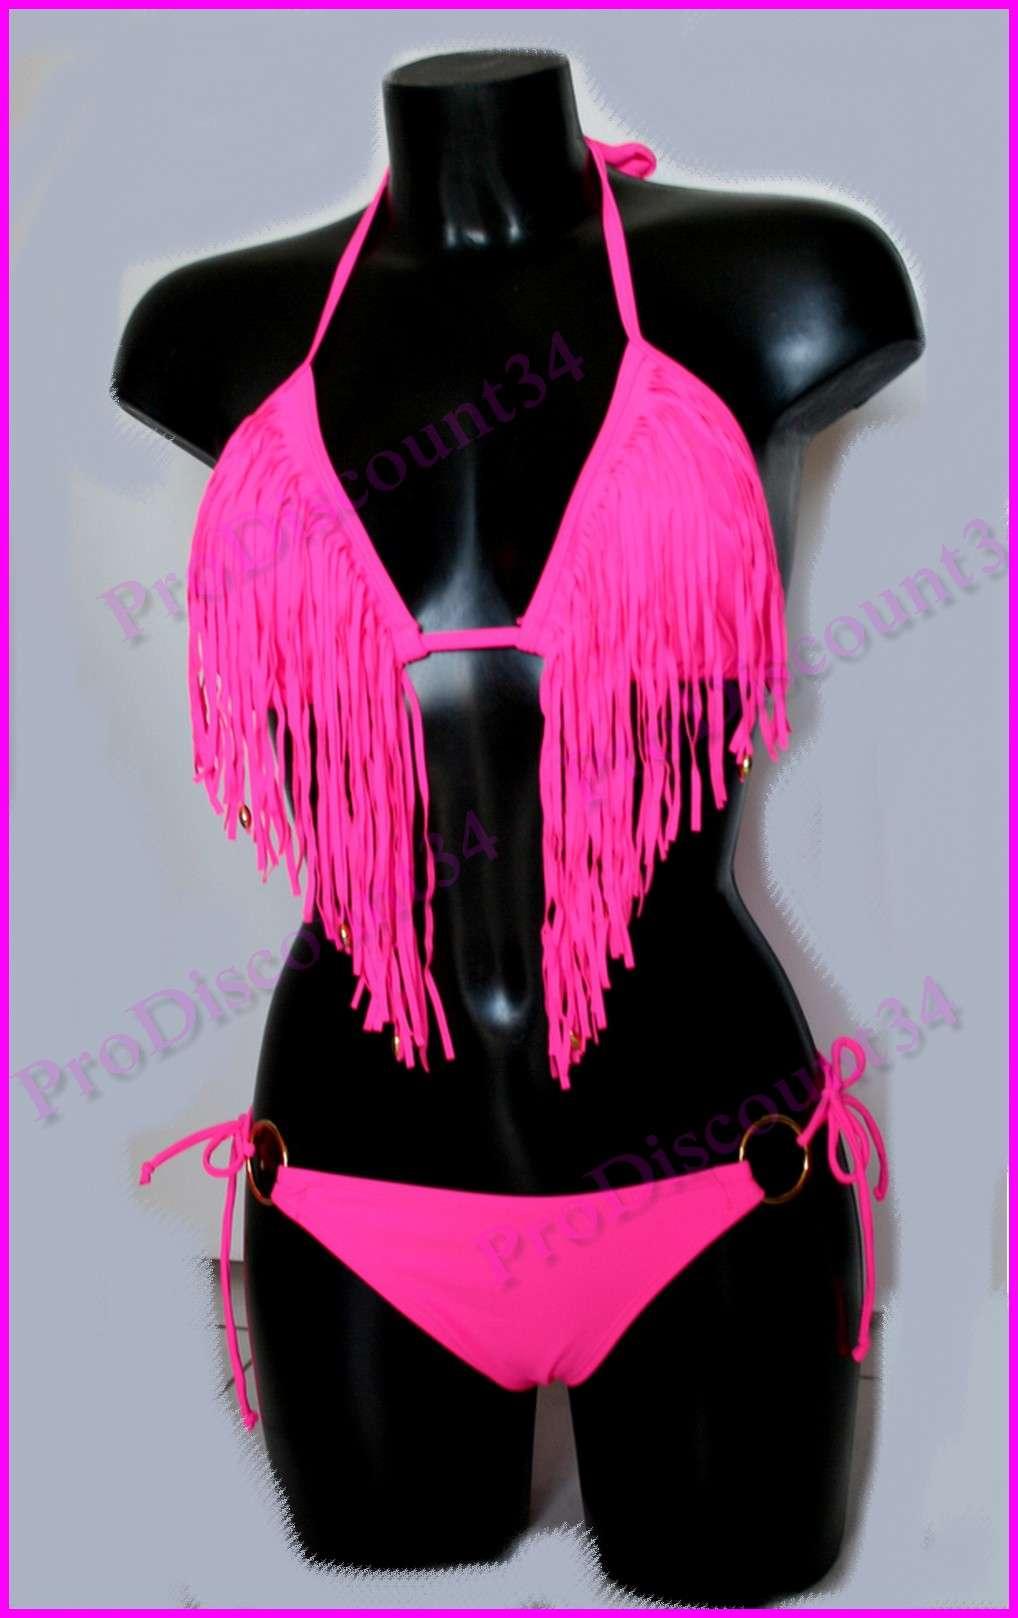 maillot de bain bikini string tanga culotte sexy top triangle frange usa 36 38 ebay. Black Bedroom Furniture Sets. Home Design Ideas